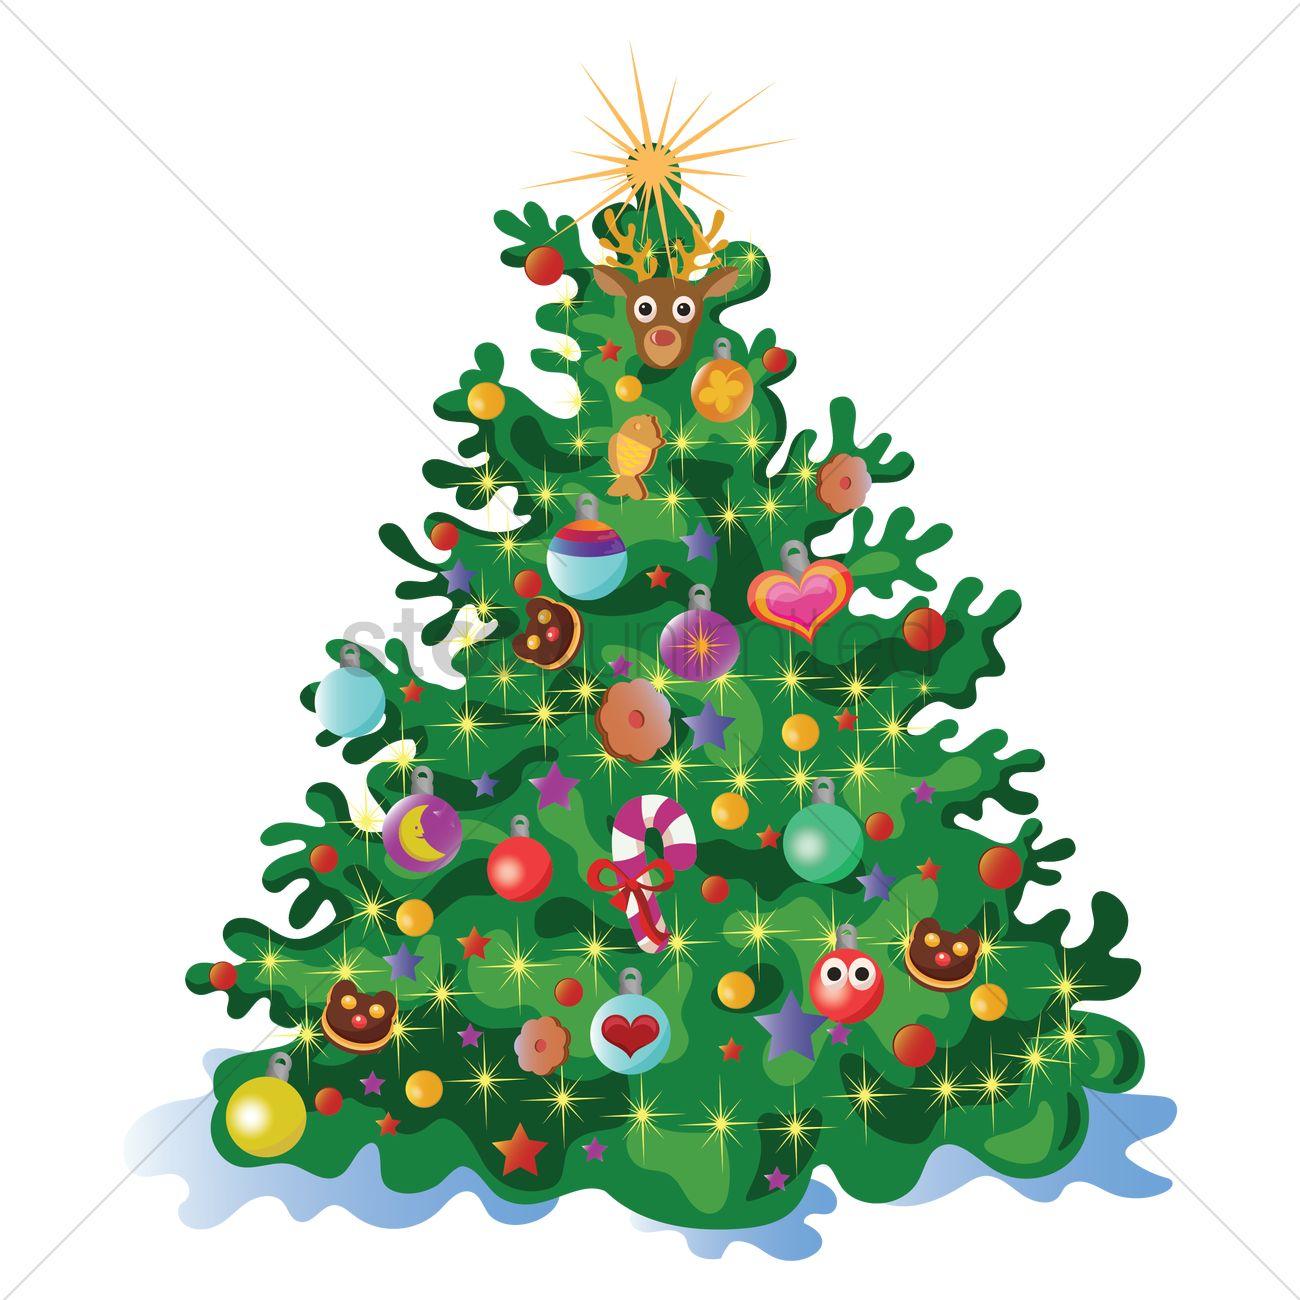 Christmas Tree Vector Free.Free Christmas Tree Vector Image 1511499 Stockunlimited